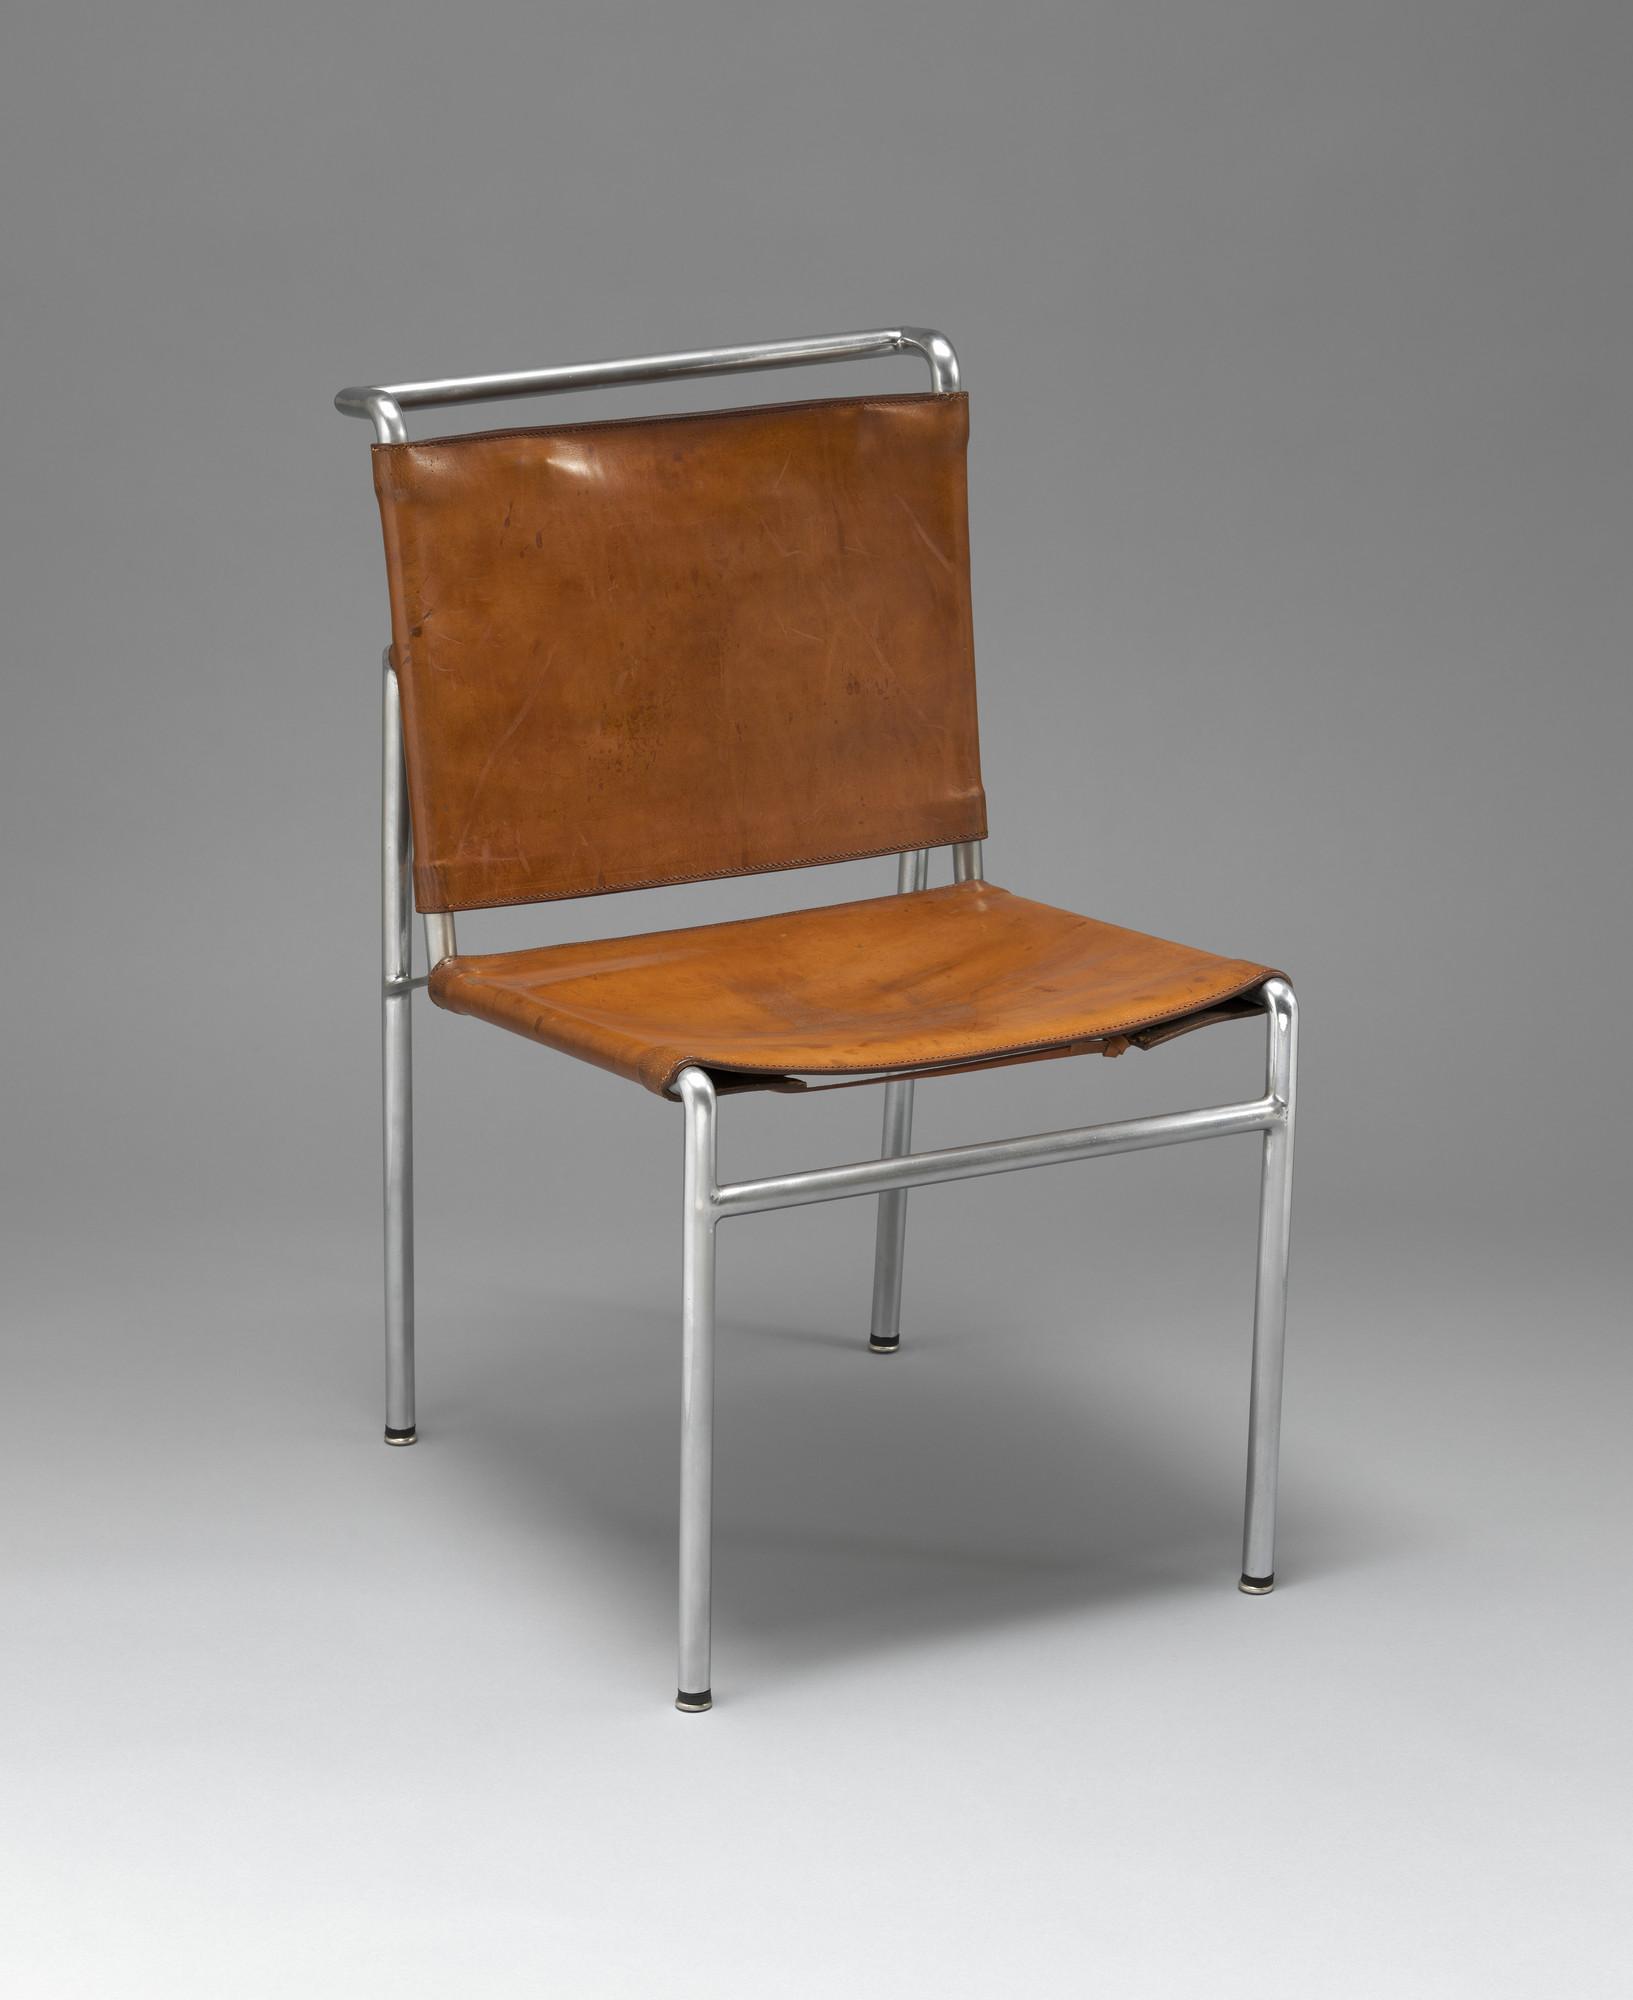 eileen grey furniture. Eileen Gray. Chair For The Villa Tempe A Pailla. C.1935 Grey Furniture